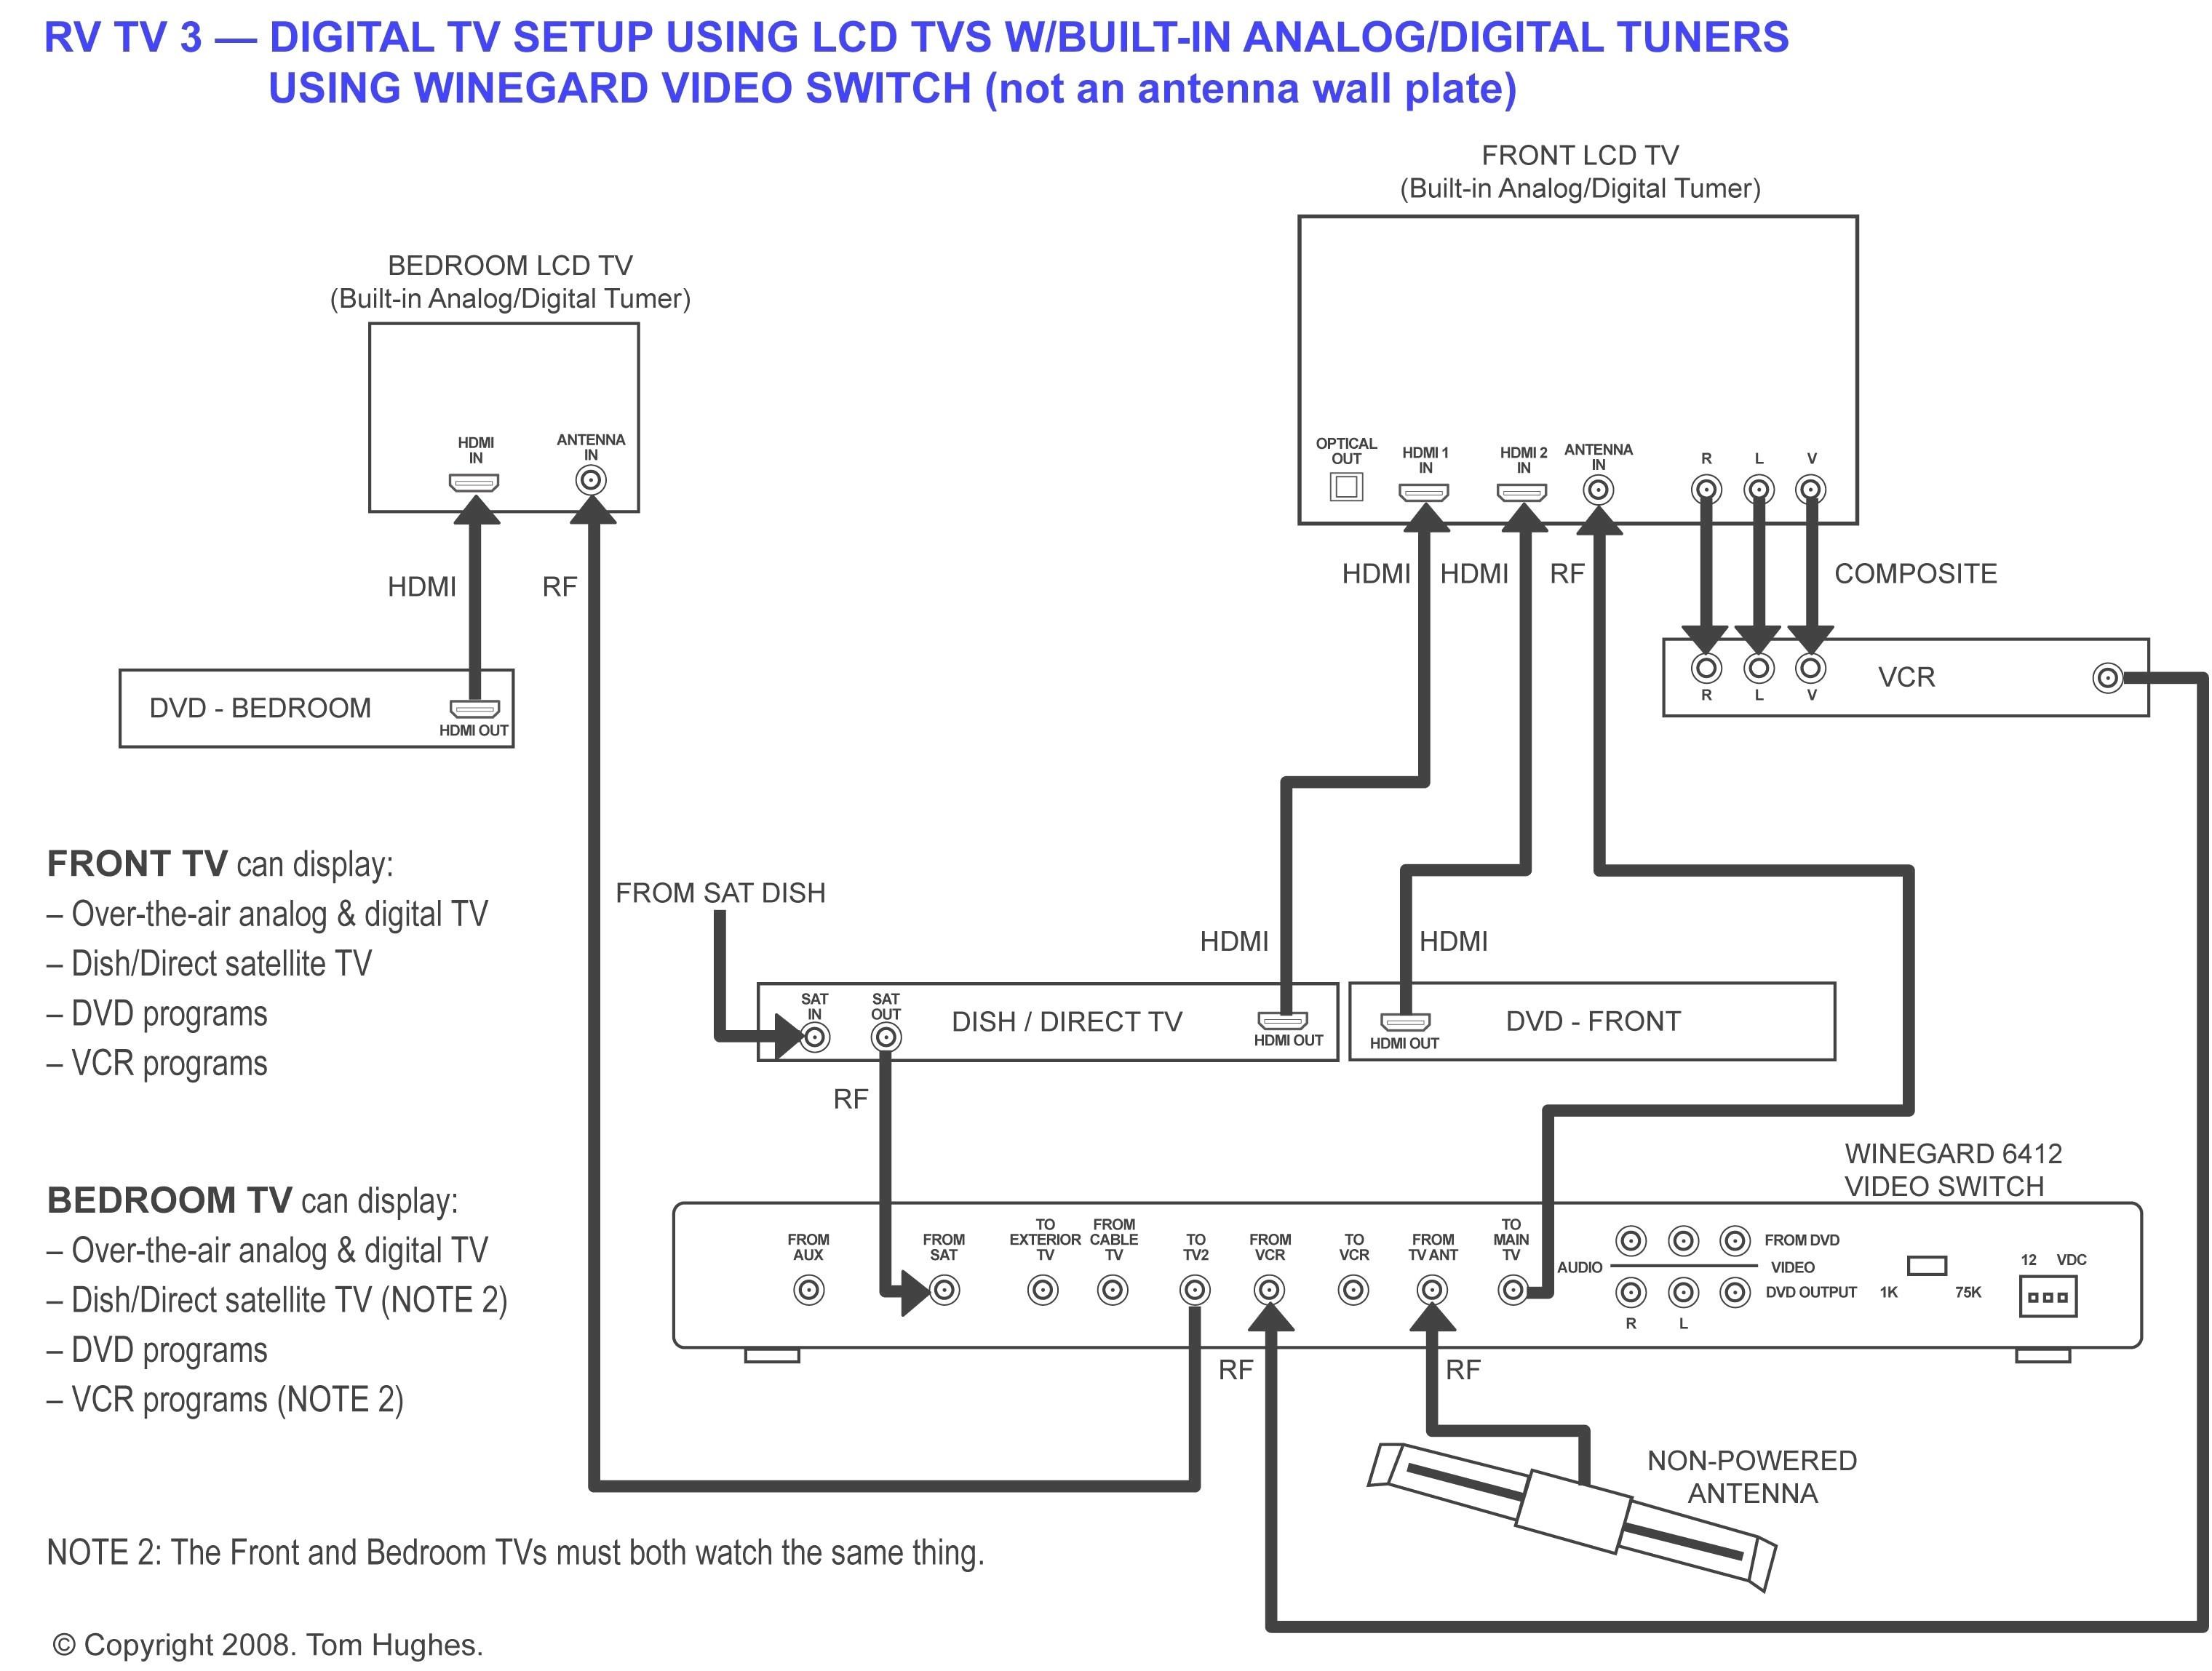 pj trailer wiring with junction box diagrams    trailer       junction       box       wiring    diagram free    wiring    diagram     trailer       junction       box       wiring    diagram free    wiring    diagram